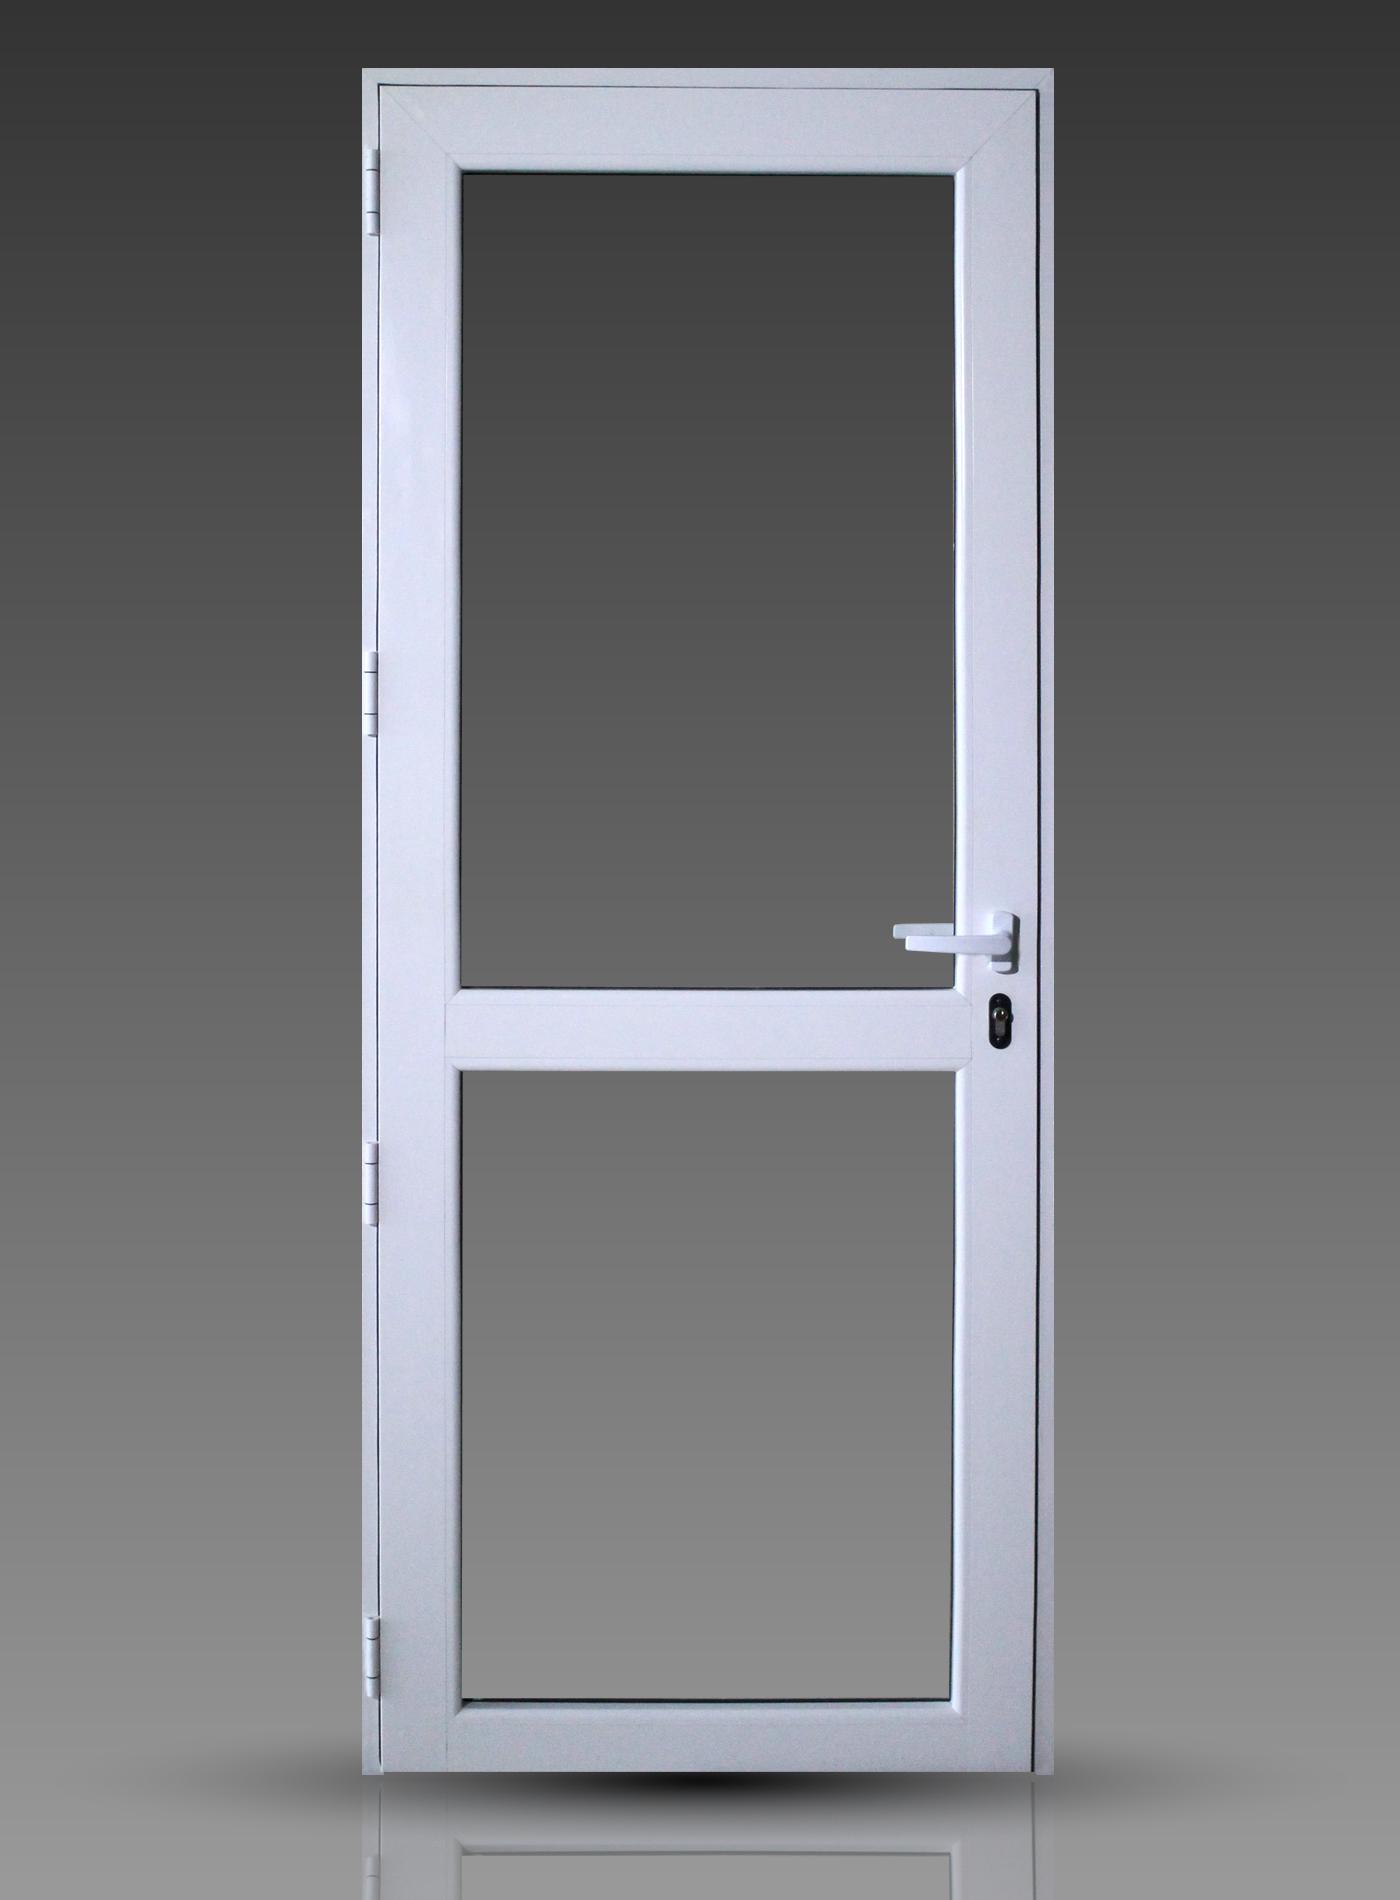 Carpinteria en aluminio Vidrieria Corporacion VC